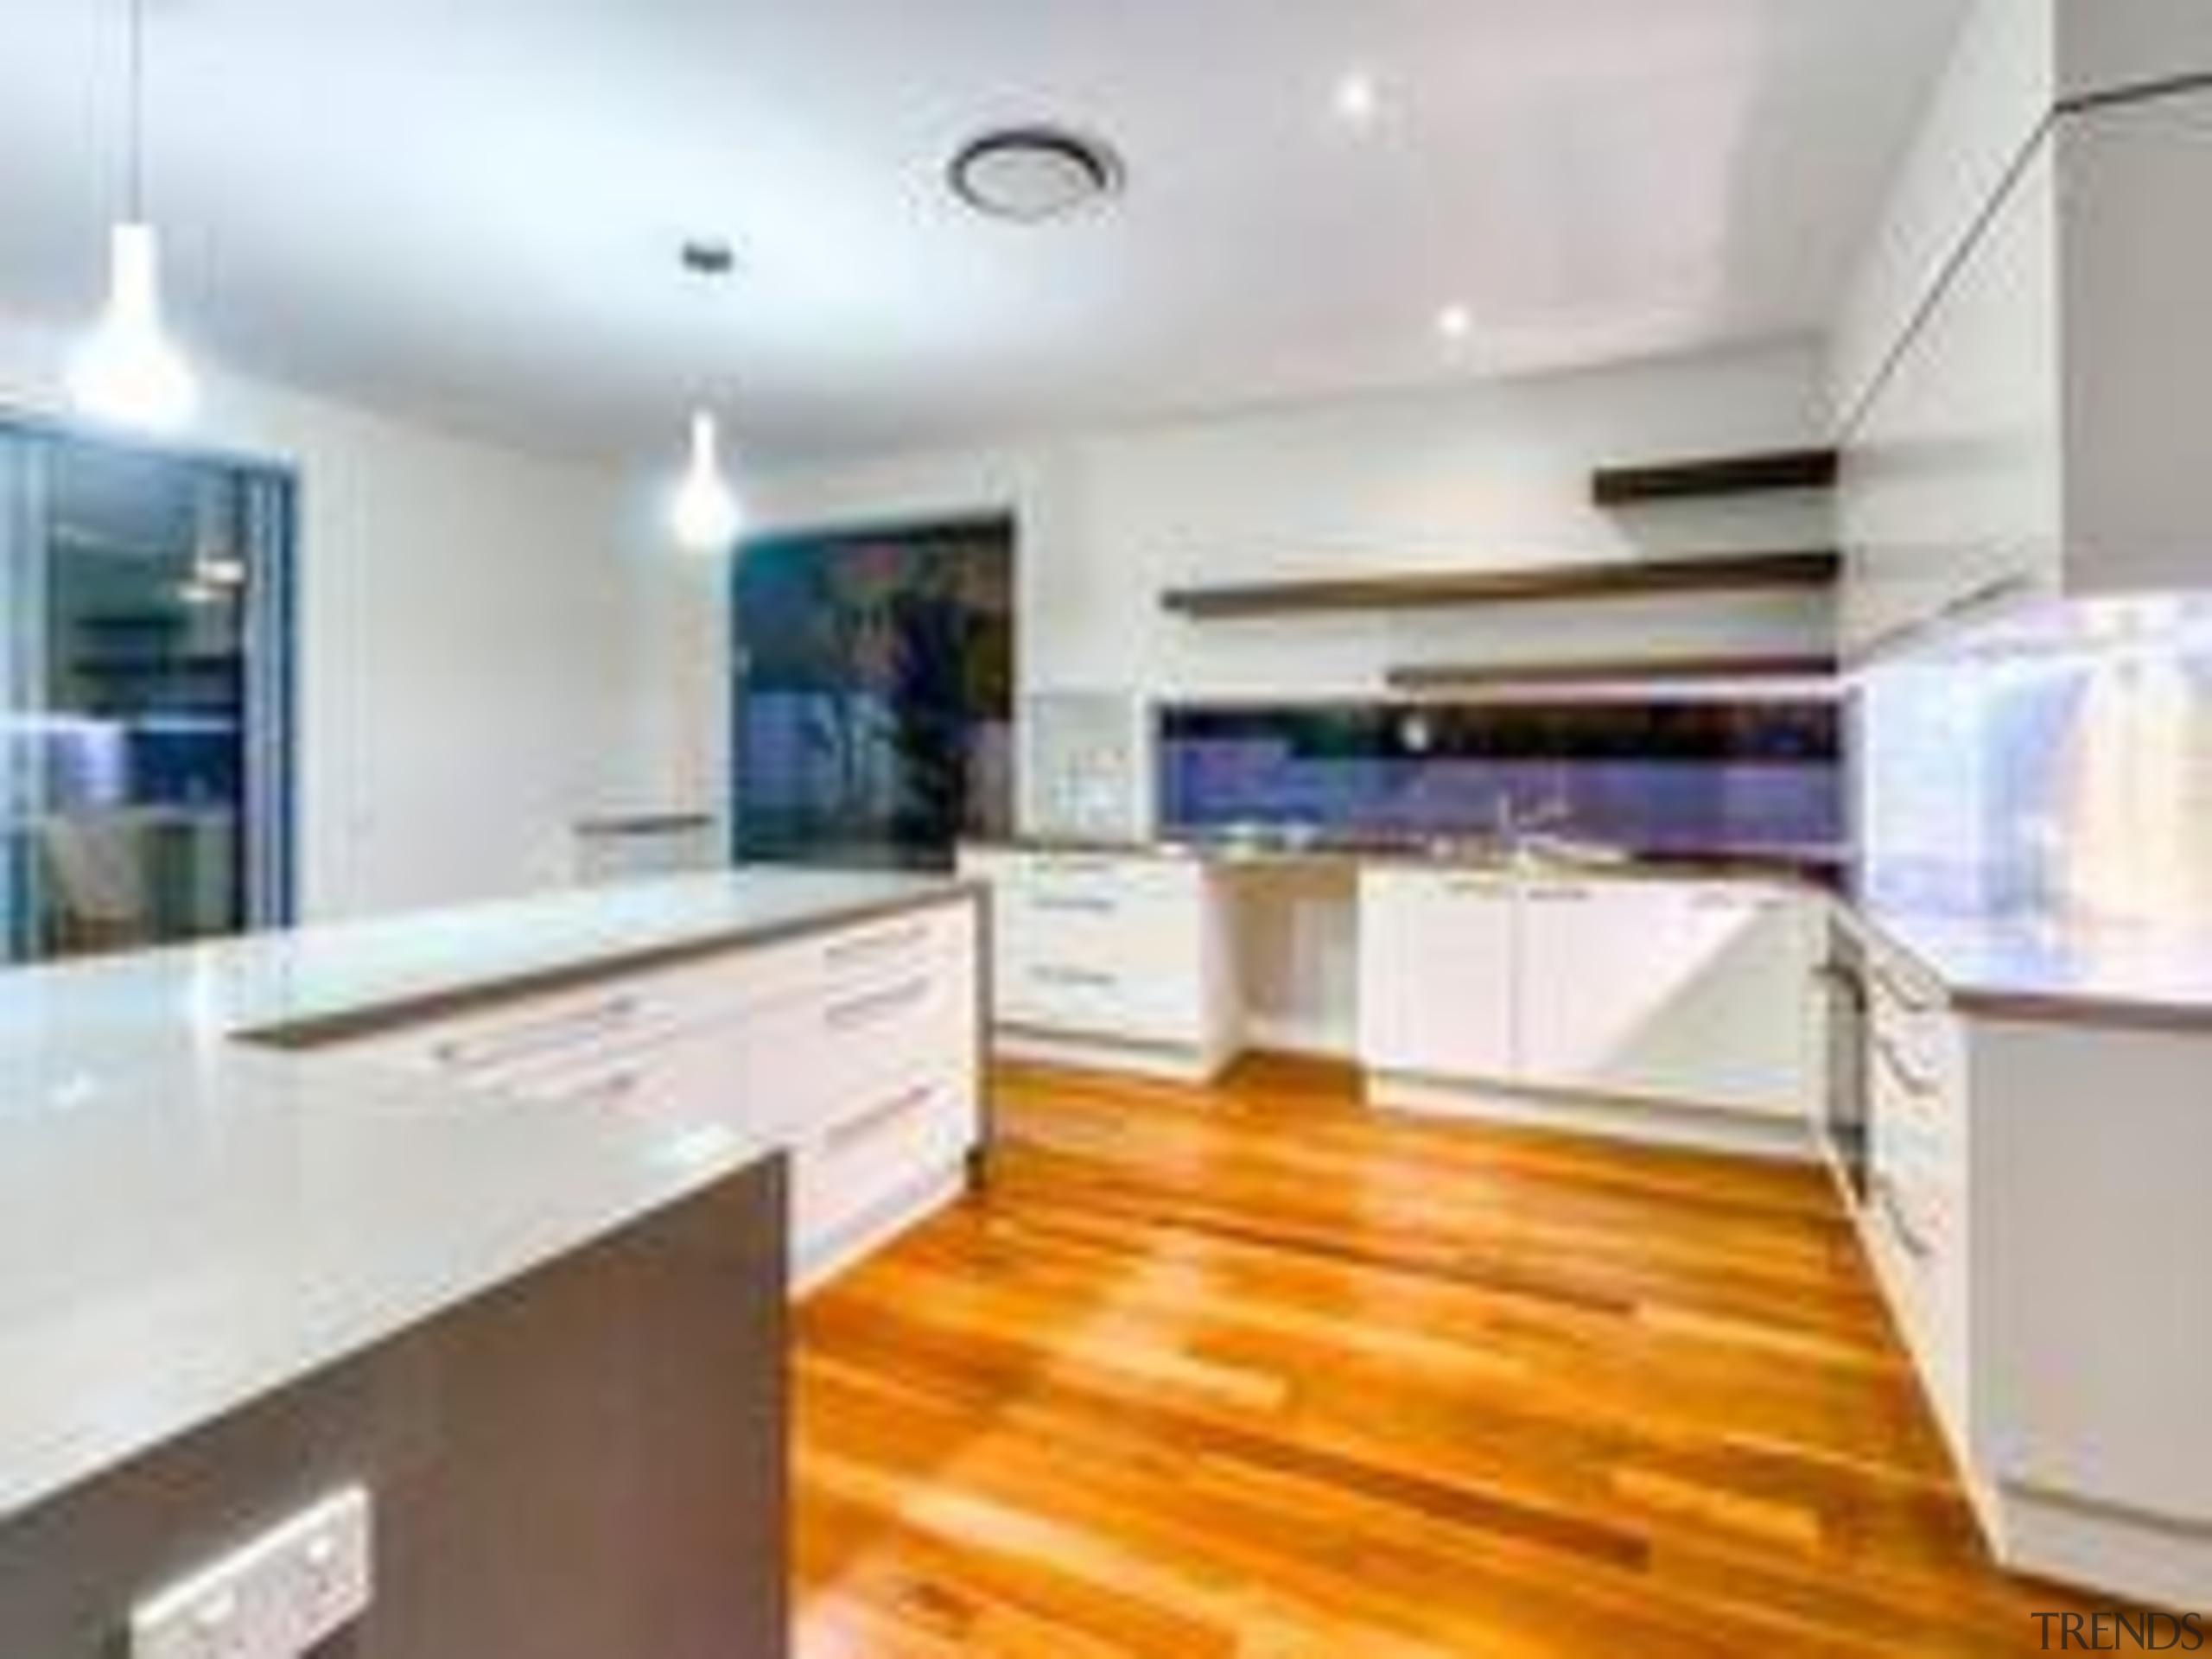 Konstruct Interior Solutions - Oyster™ - countertop | countertop, floor, hardwood, interior design, kitchen, property, real estate, room, wood flooring, gray, white